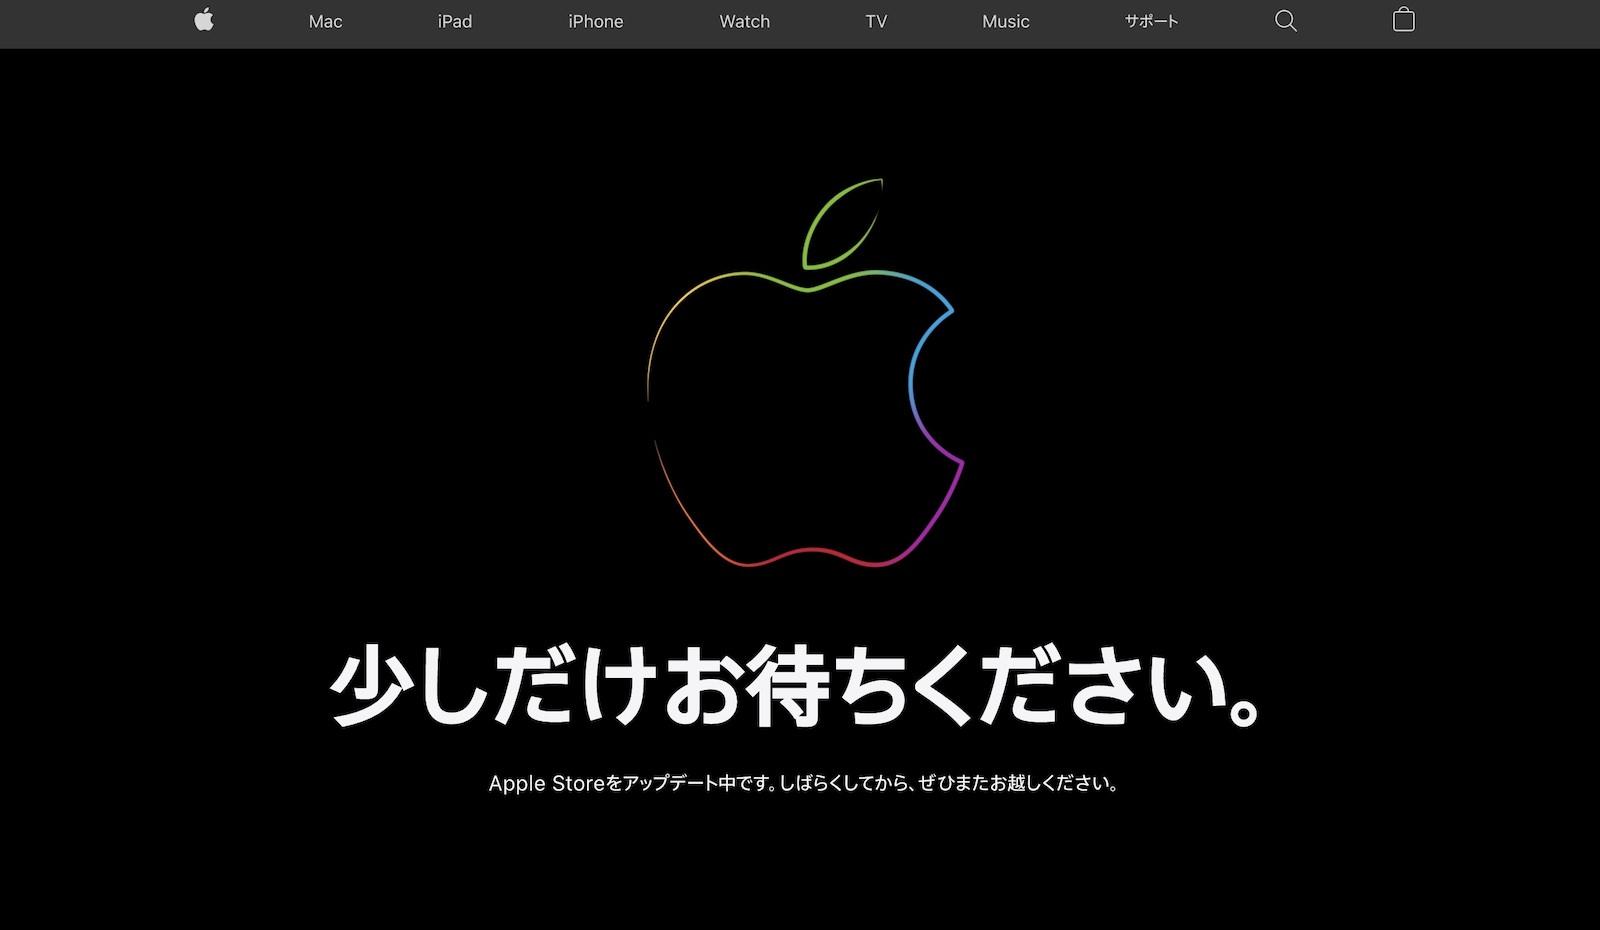 Apple Store id in maintenance